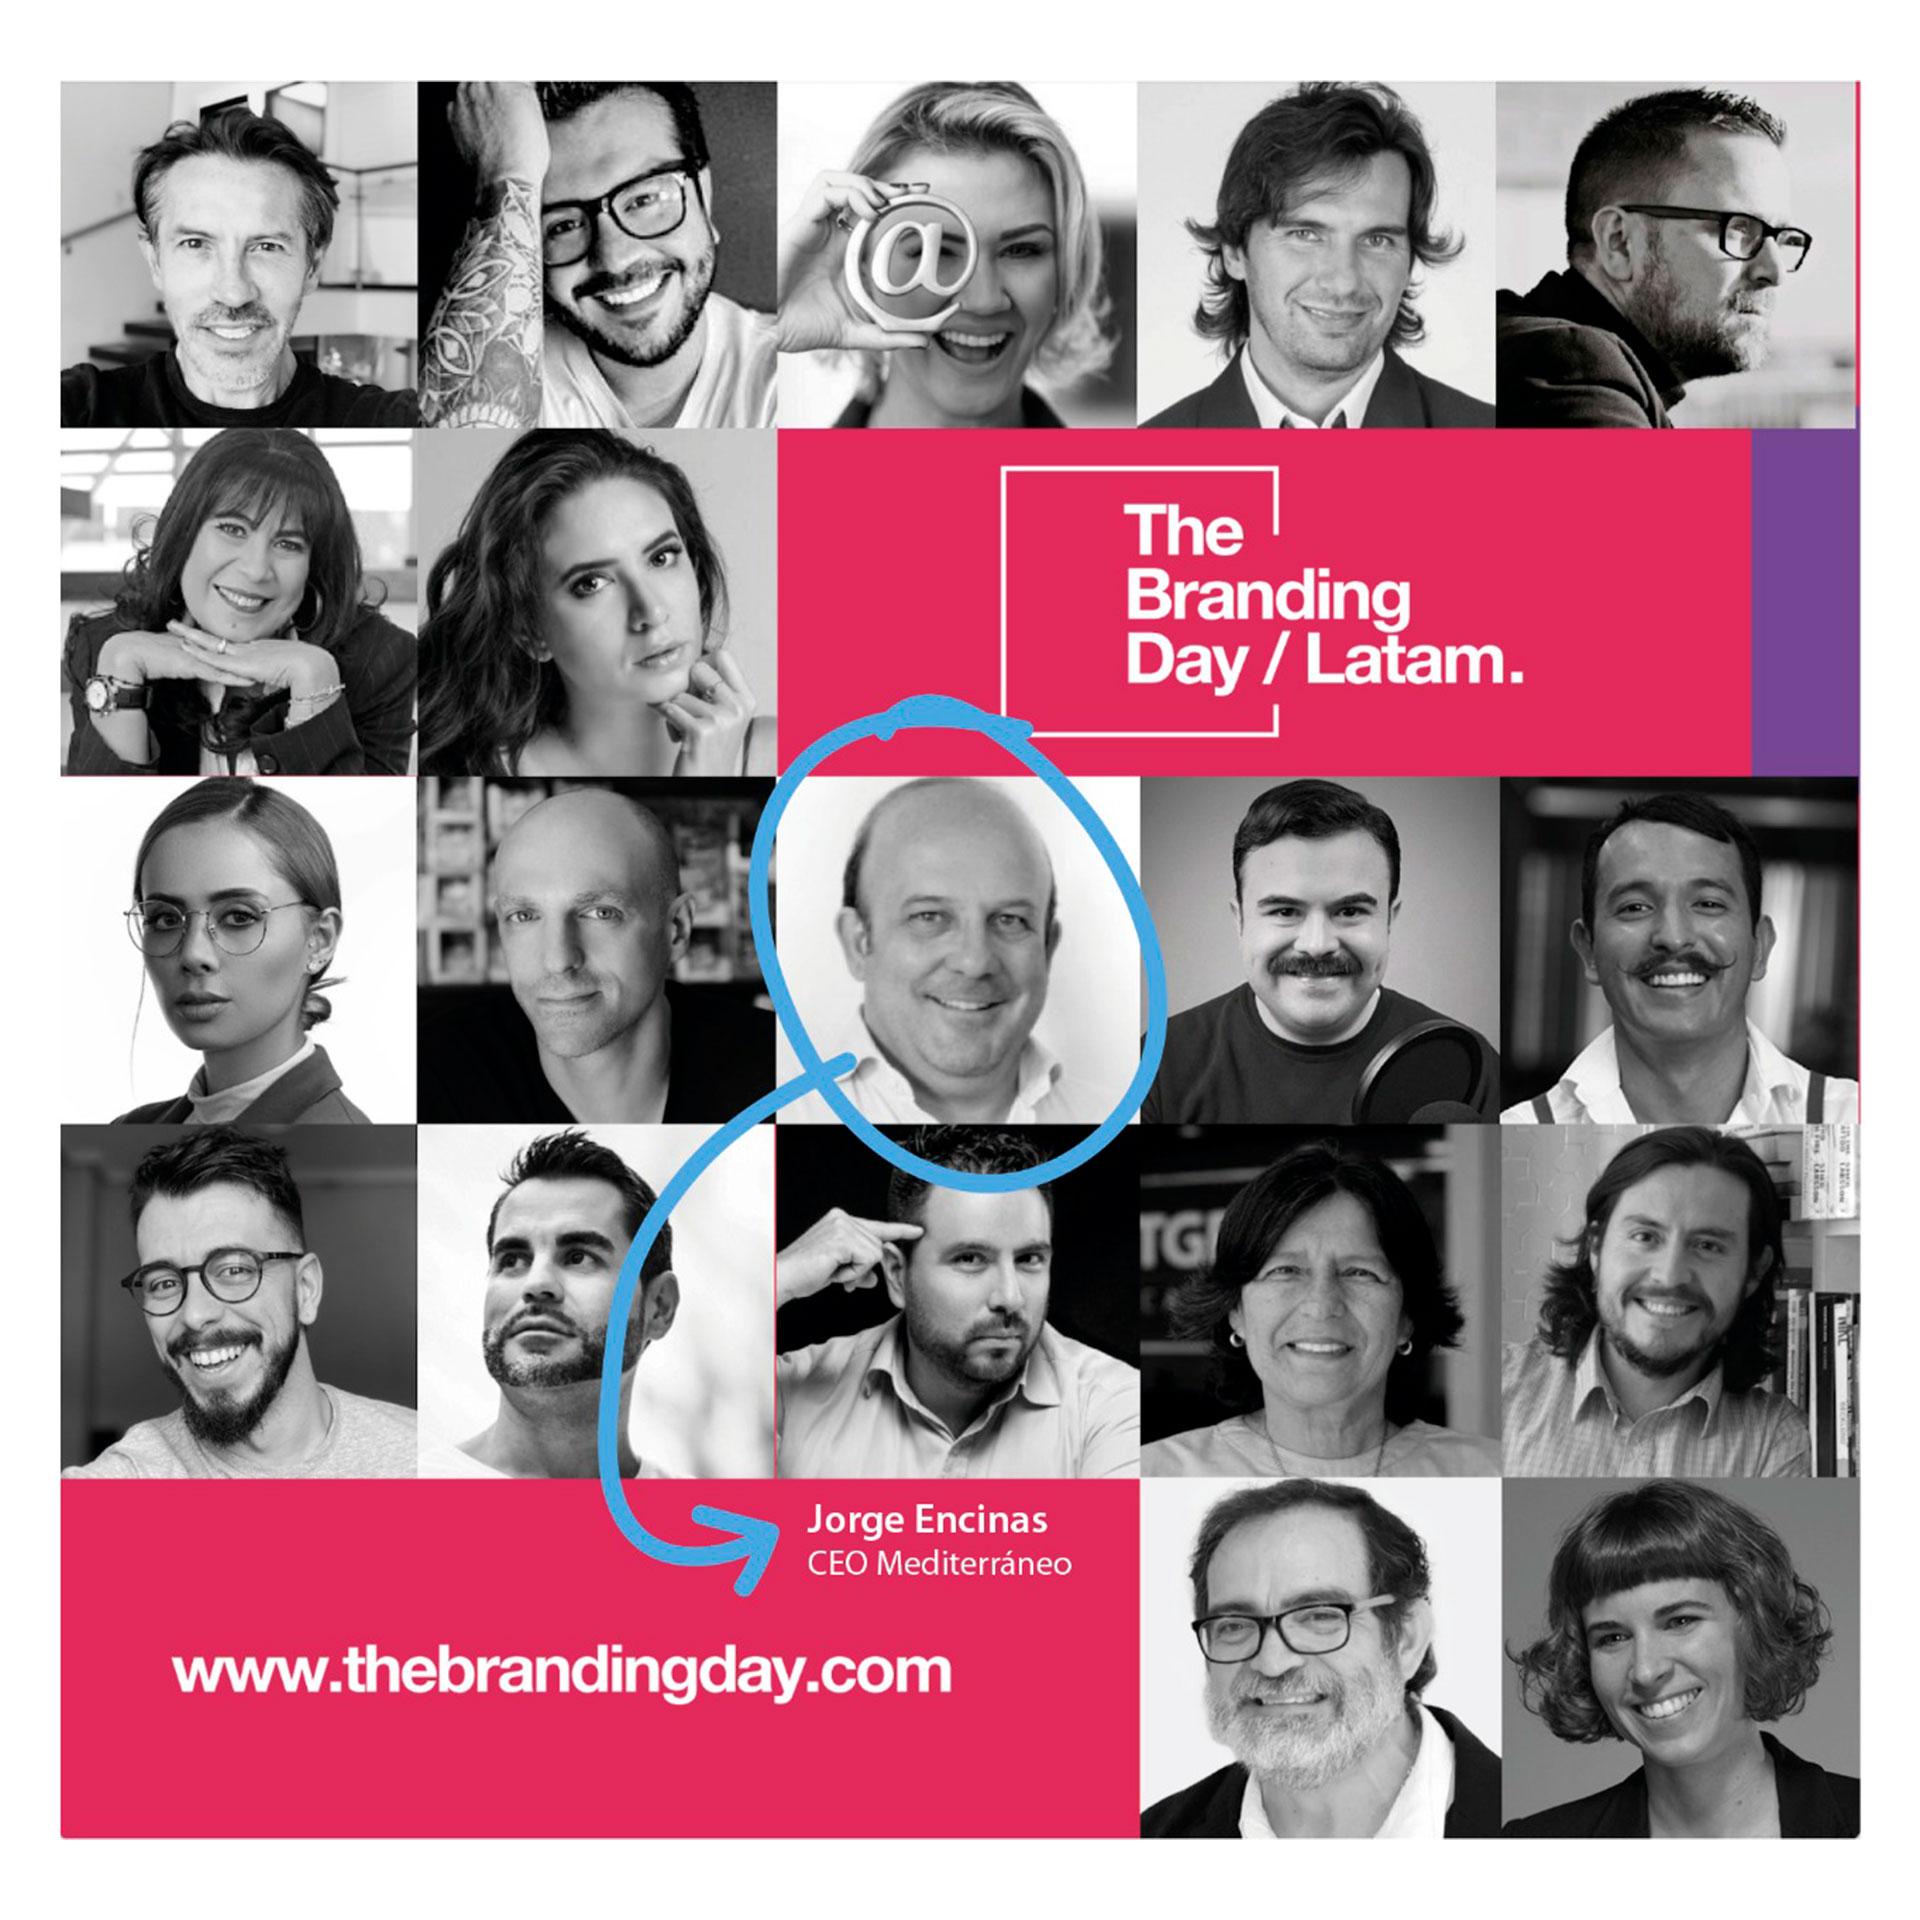 The Branding Day